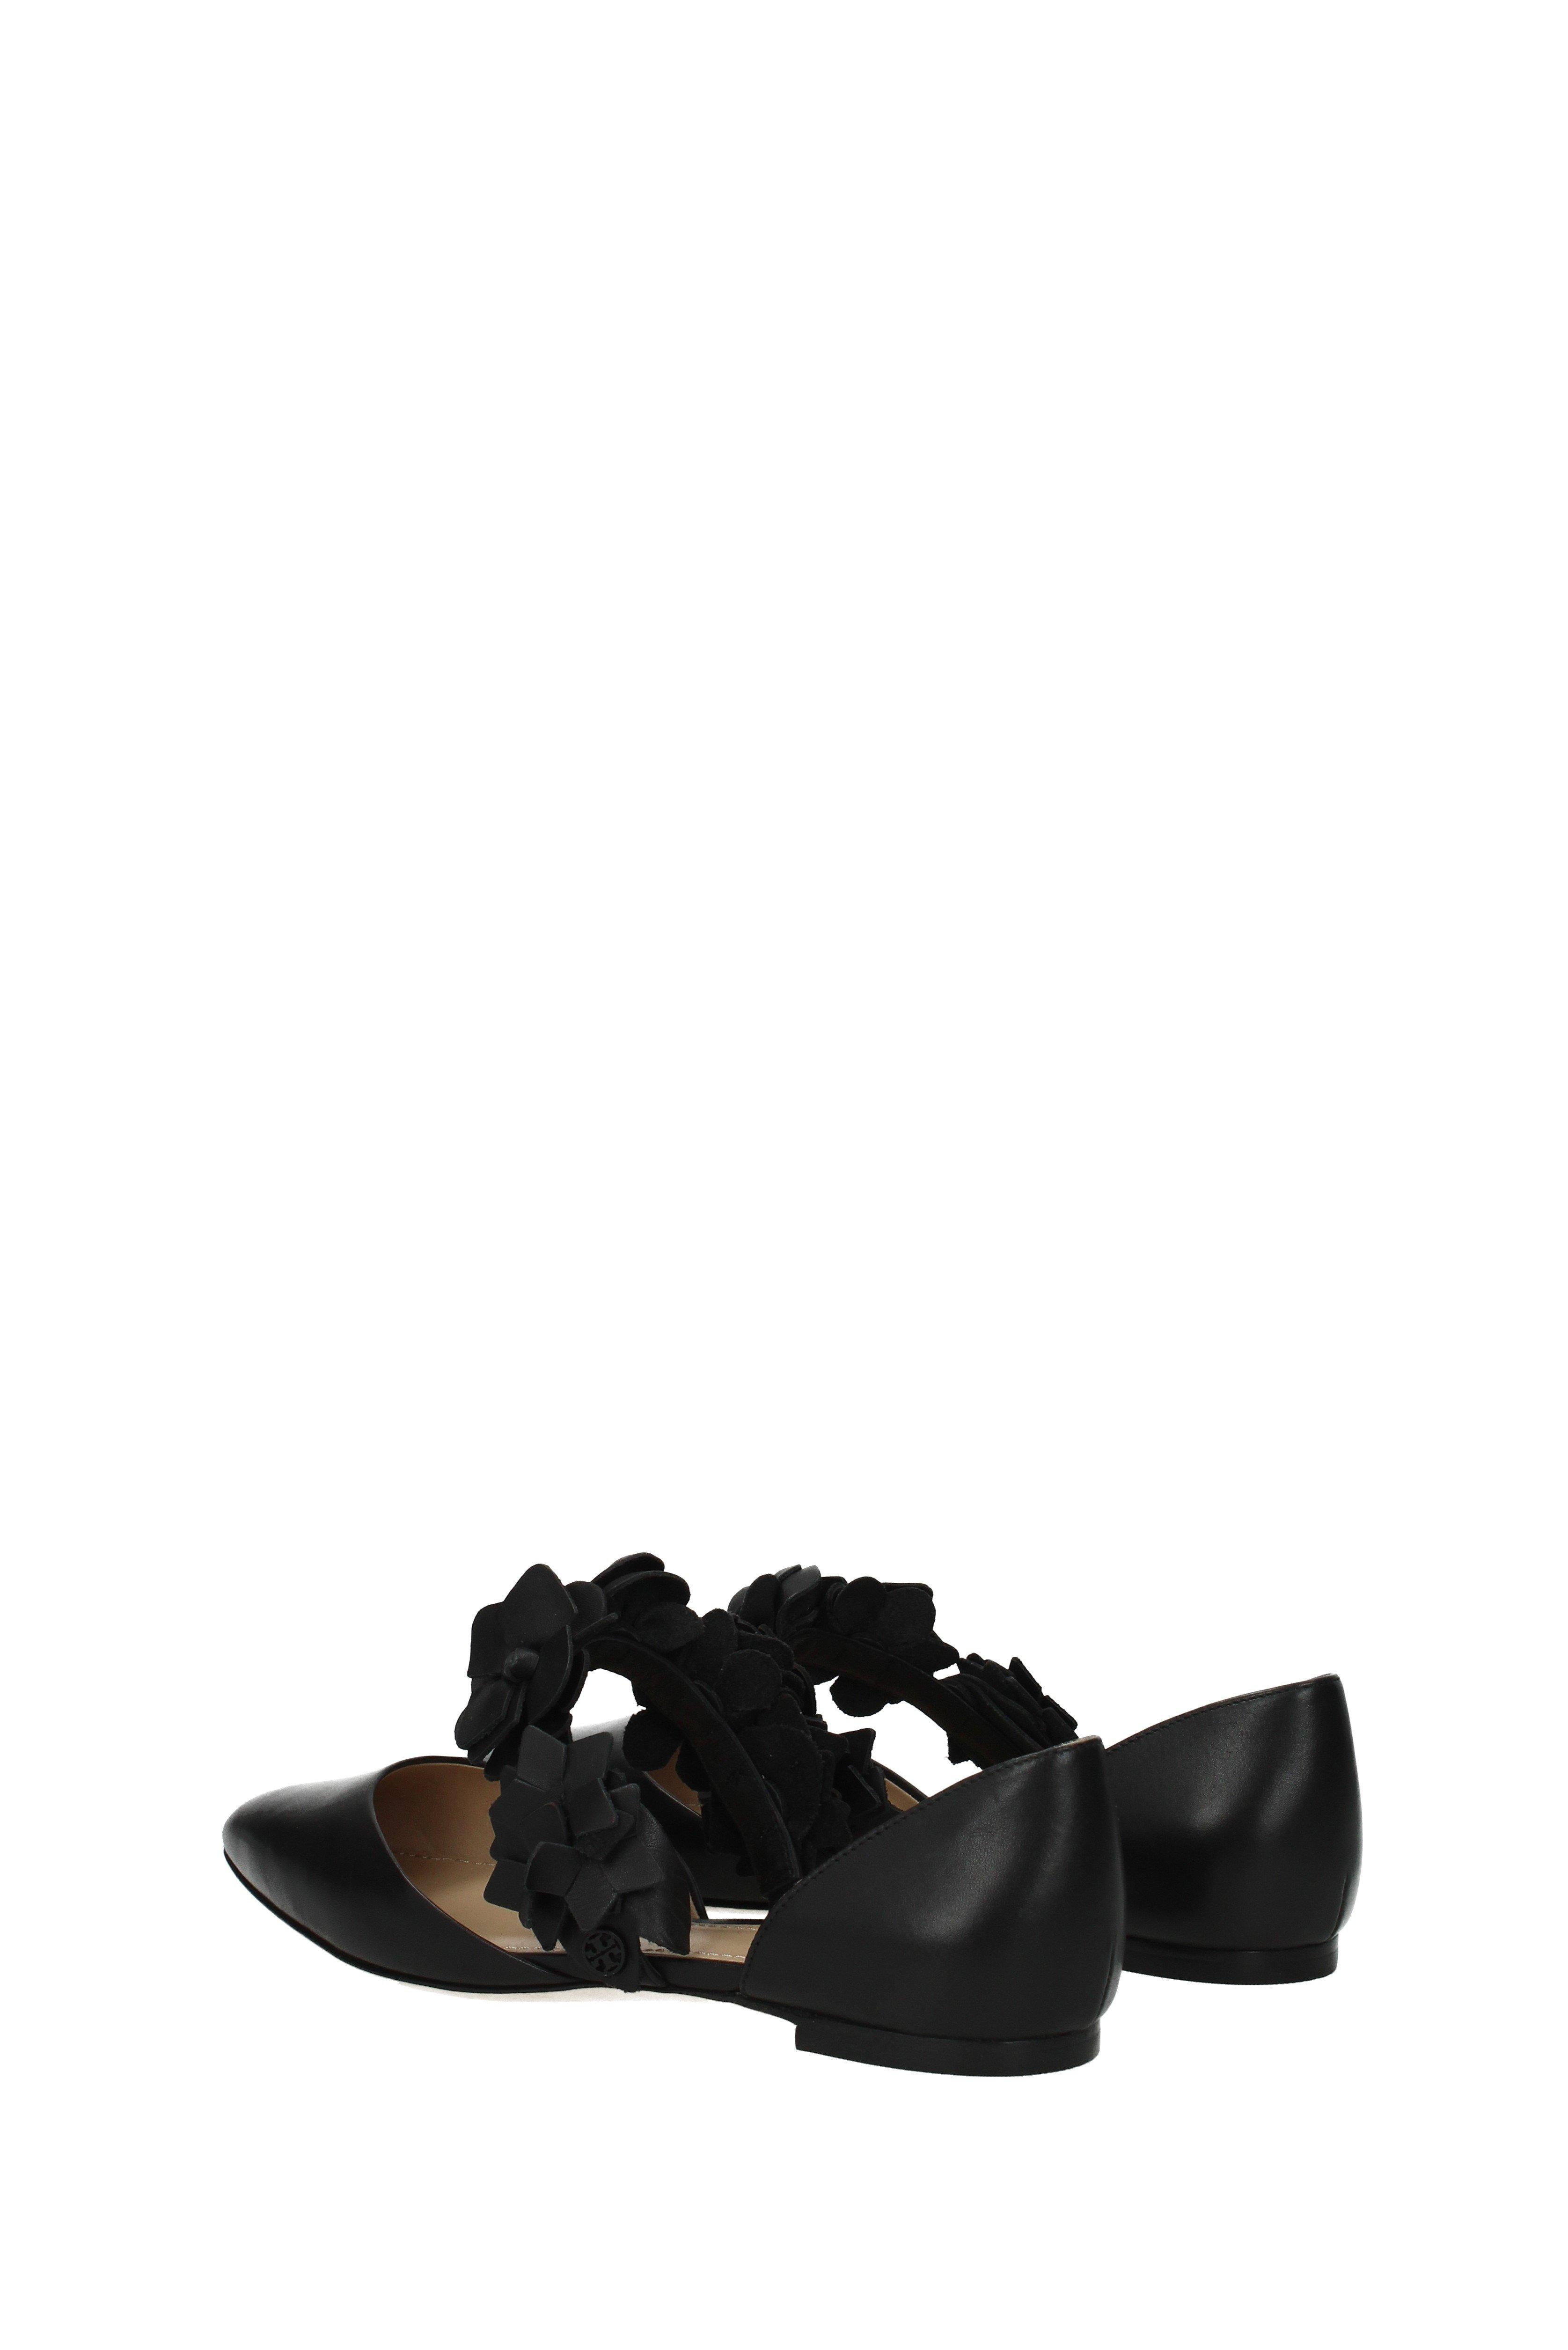 6dc021c7f Lyst - Tory Burch Sandals Blossom D orsay Women Black in Black